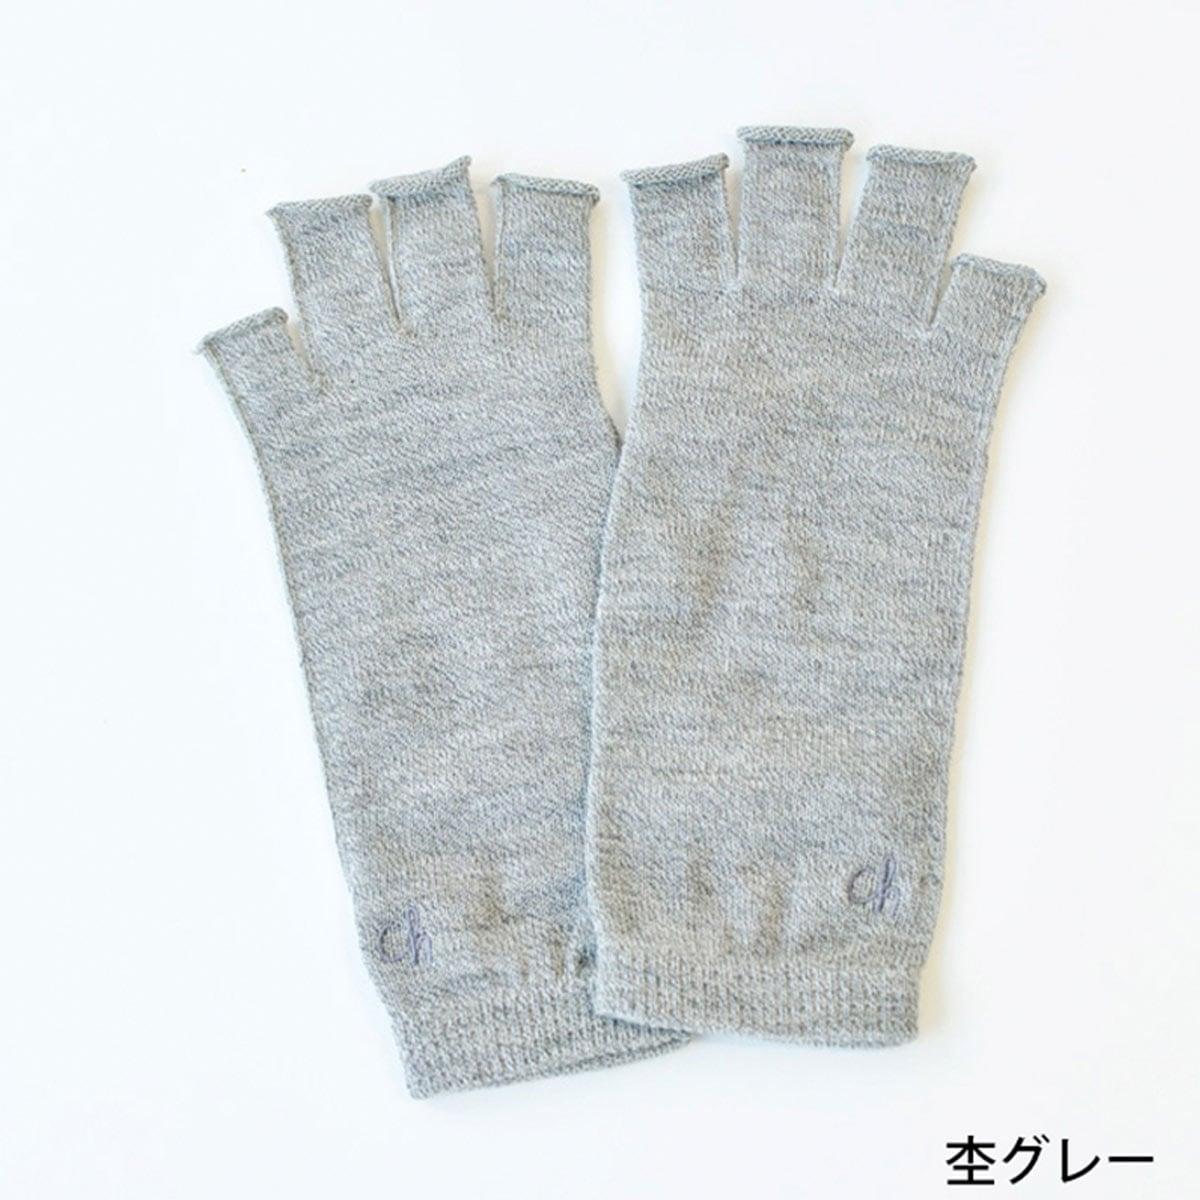 Comfort hugge(コンフォートハグ)マシュマロインナー フレンチ袖